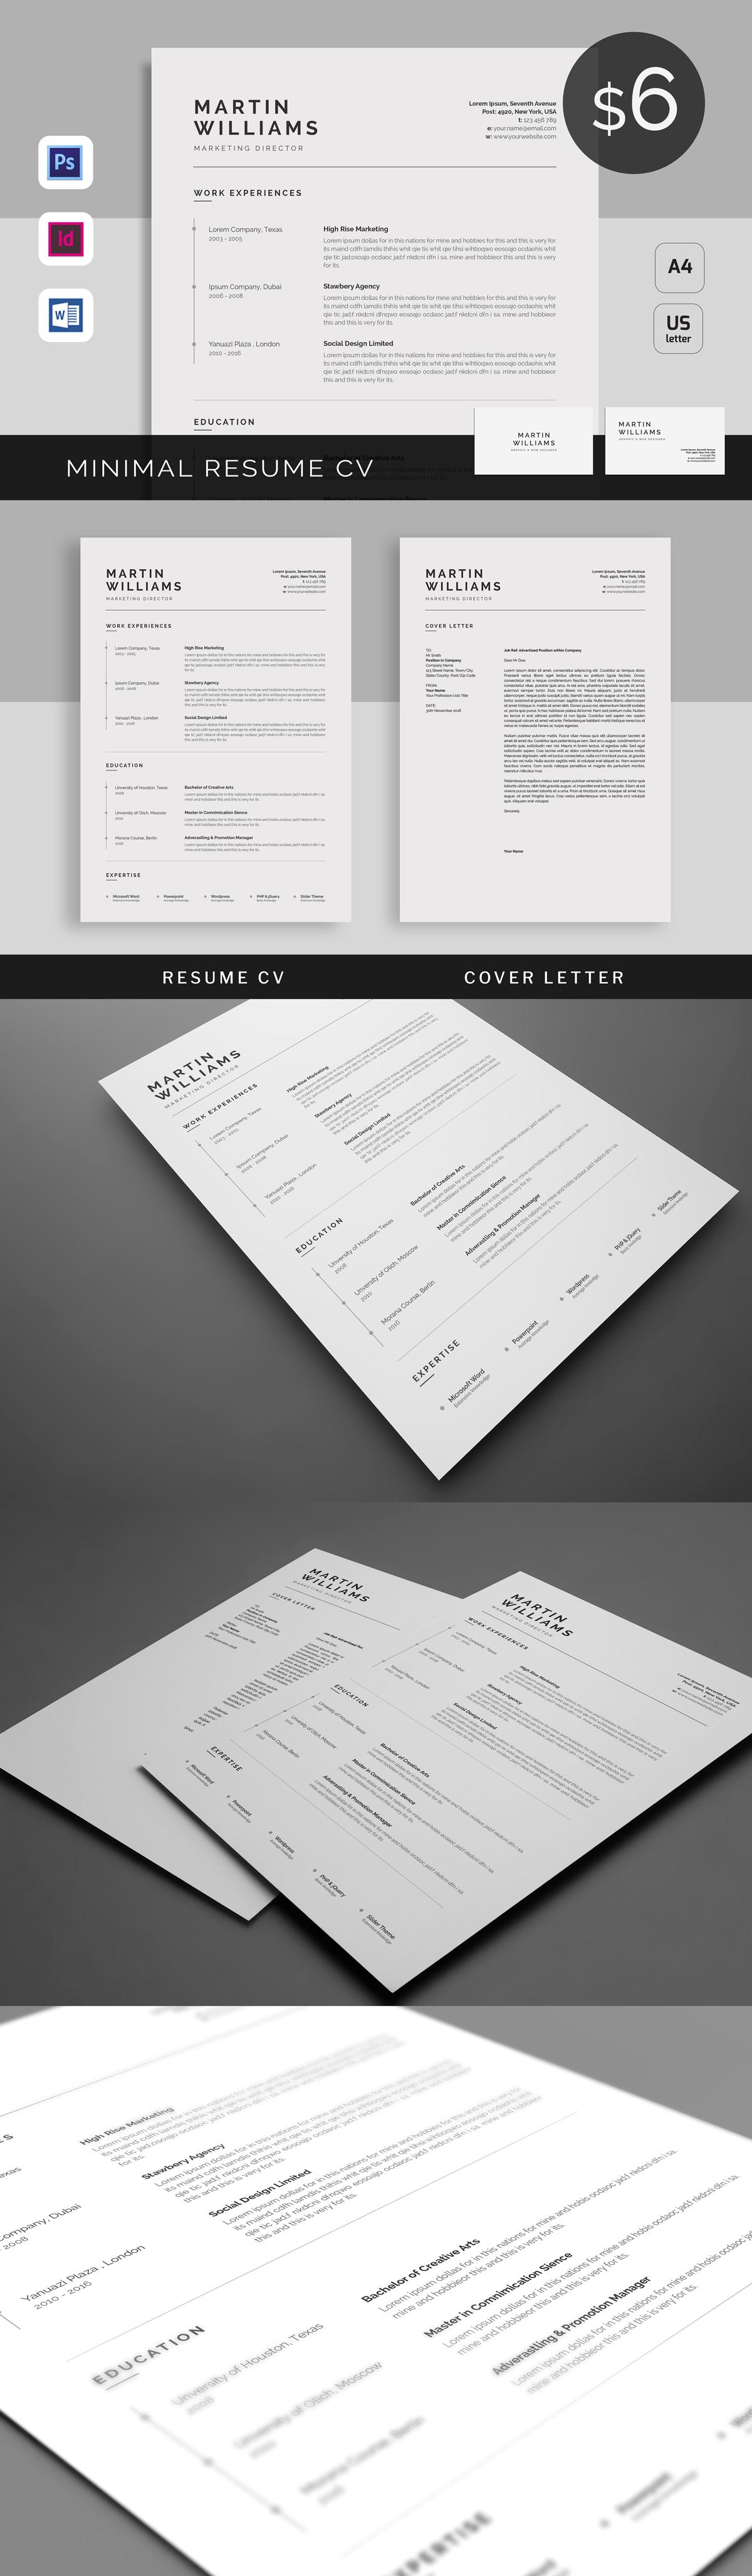 Resume/CV Template INDD | Resume Templates | Pinterest